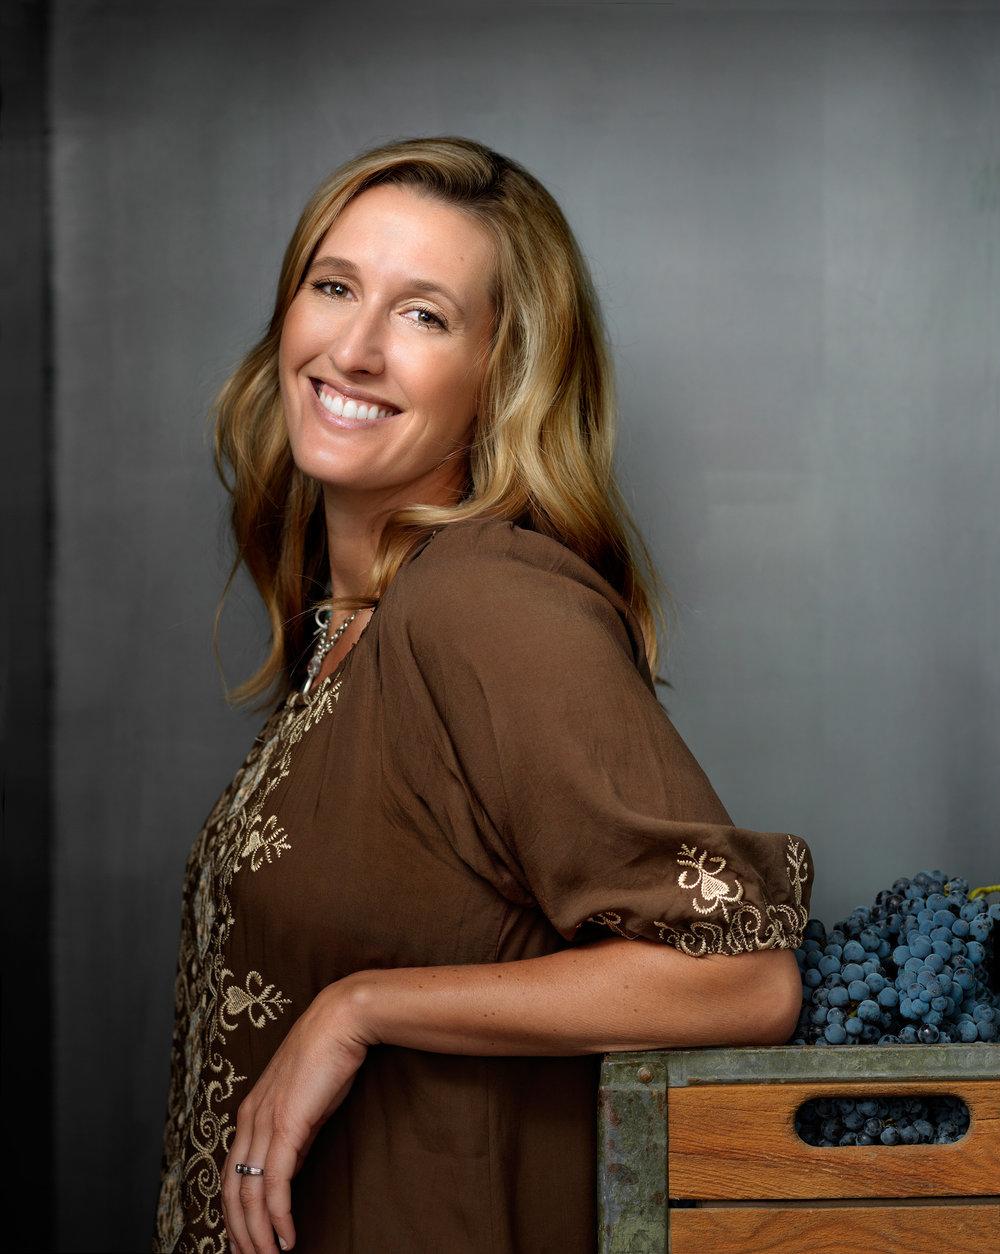 AMANDA WITTSTROM HIGGINS, VP OF OPERATIONS, ANCIENT PEAKS WINERY